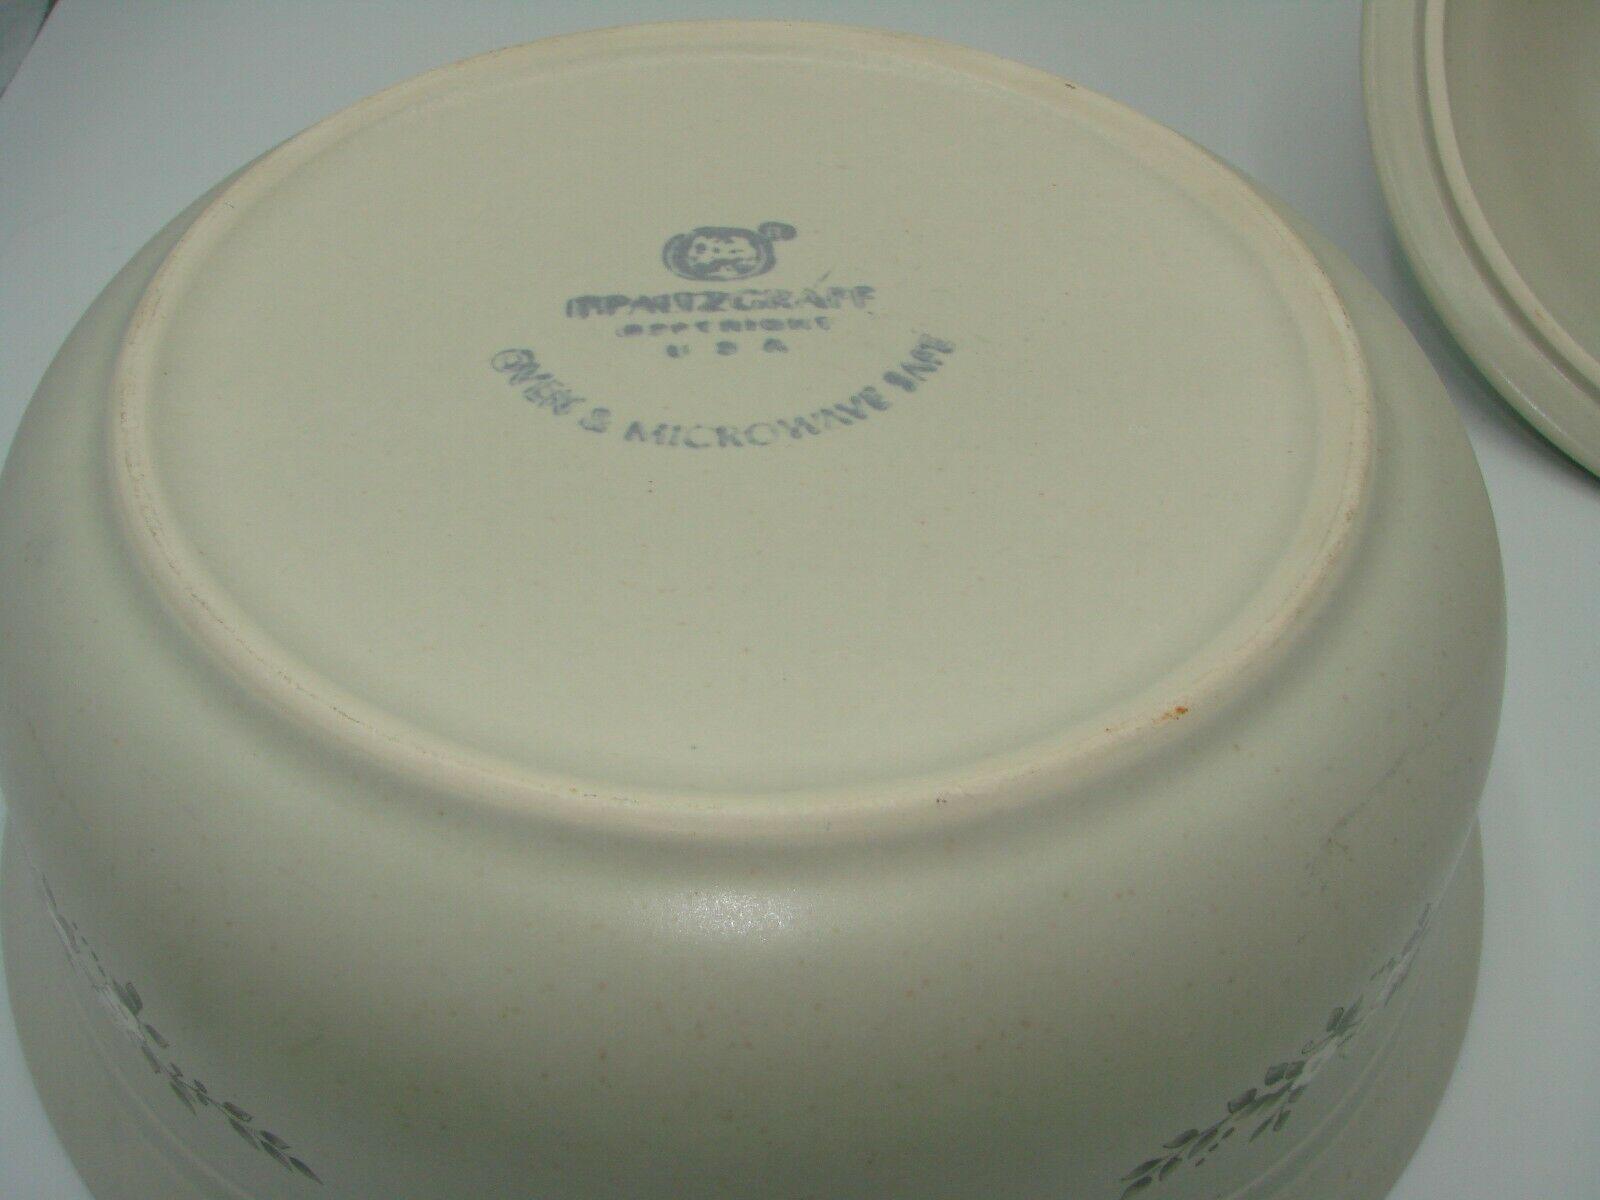 Pristine Pfaltzgraff Heirloom Covered Casserole Dish 8.75 2 Quart White Flowers image 5